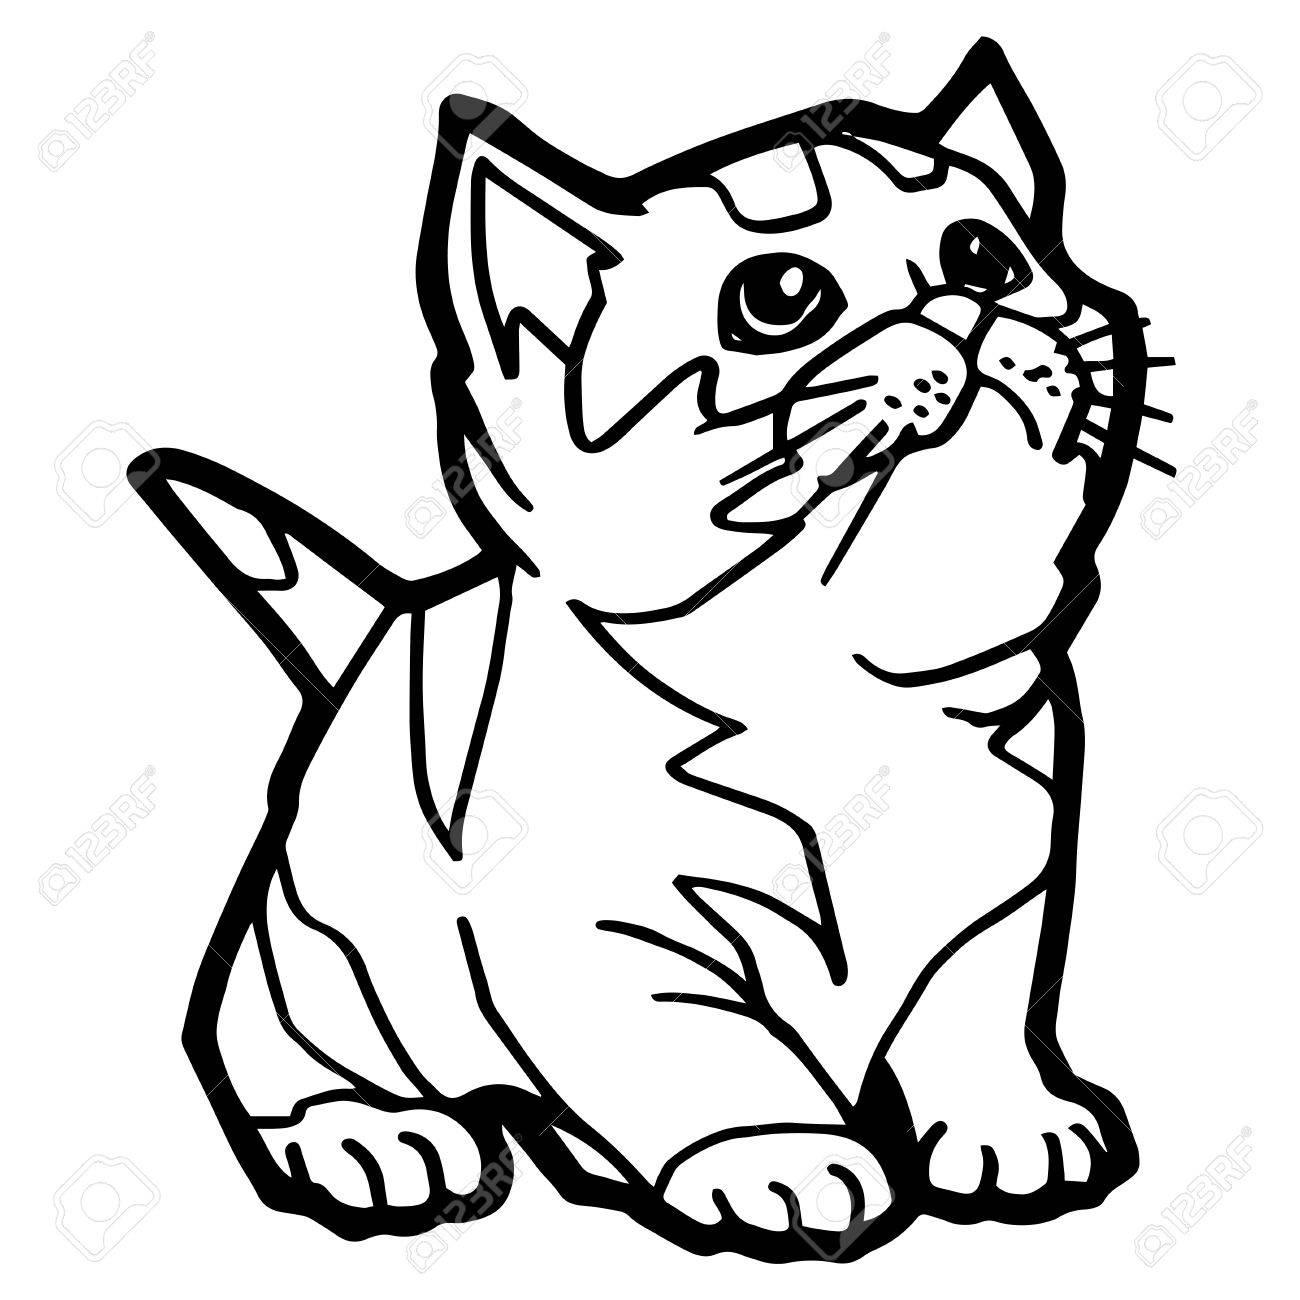 Kleurplaten Dieren Kat Coloring And Drawing